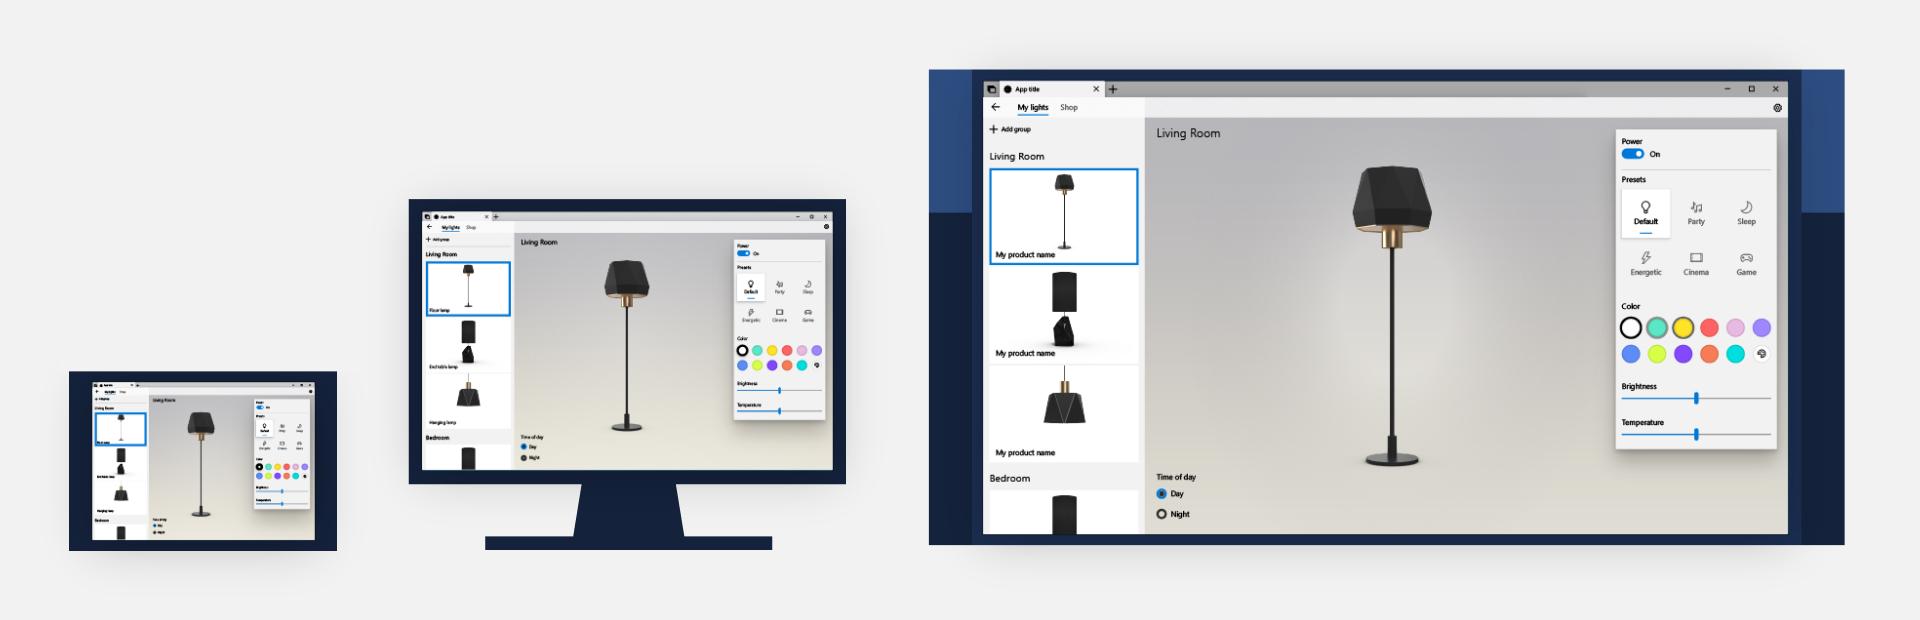 Introduction to Universal Windows Platform (UWP) app design (Windows ...